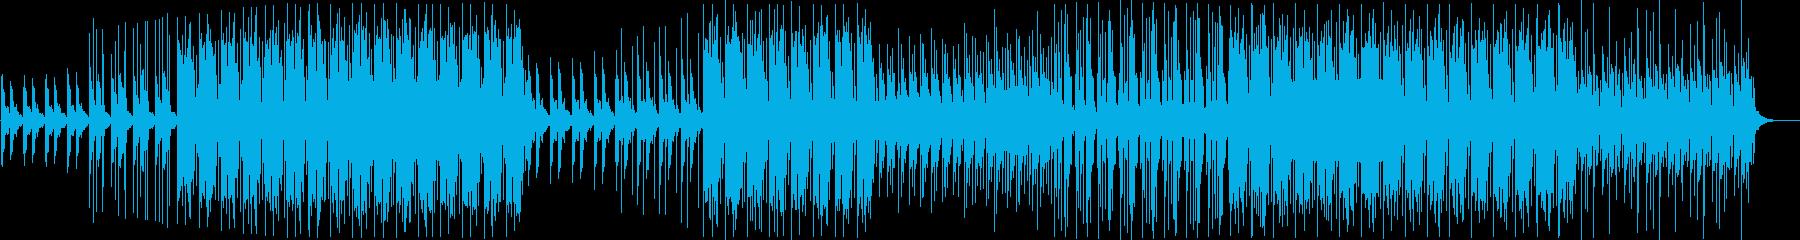 TikTok YouTube明るいBGMの再生済みの波形